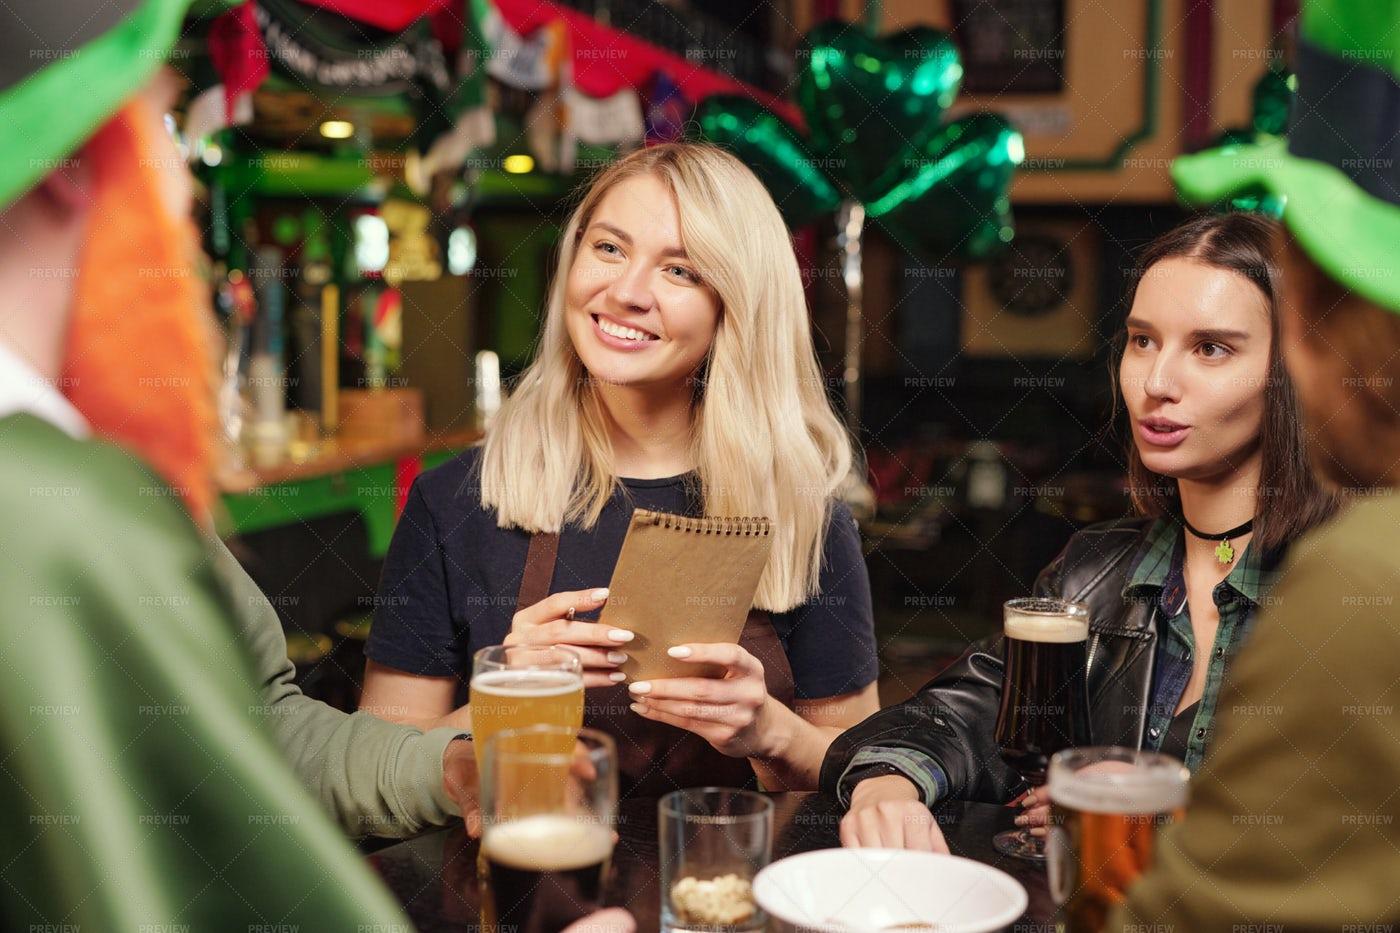 Celebration Of Patricks Day In The Pub: Stock Photos